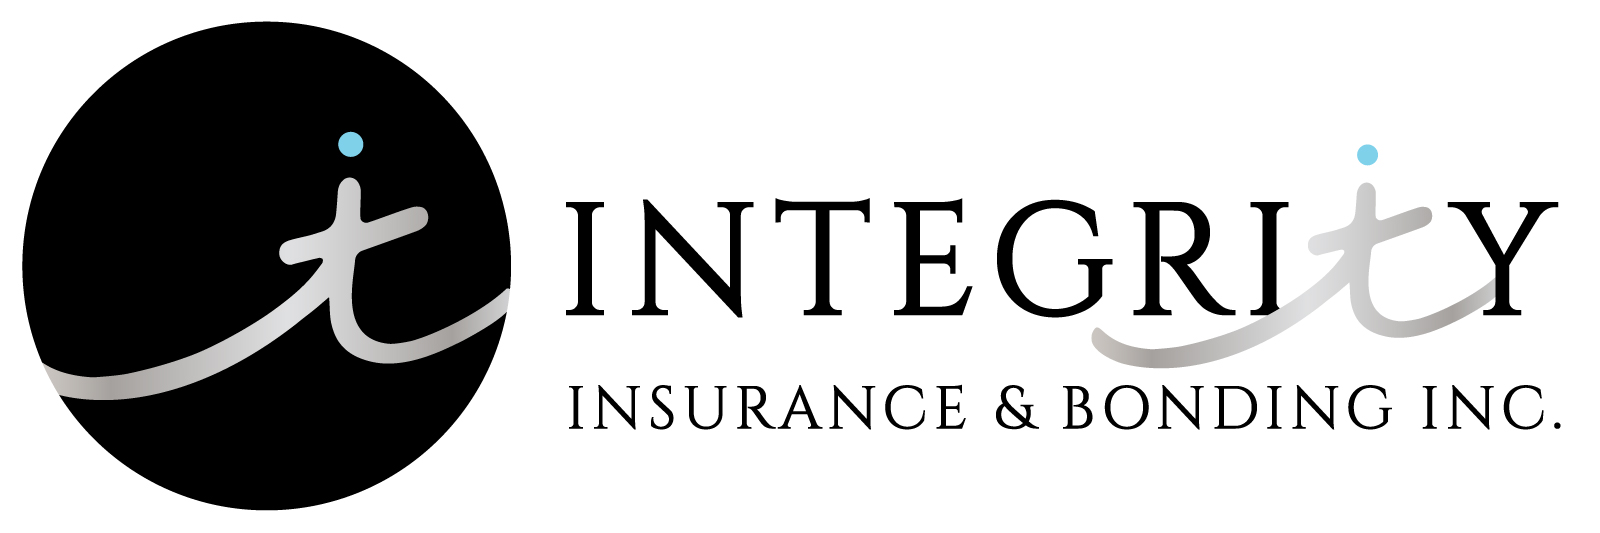 Integrity Insurance & Bonding Inc - Logo